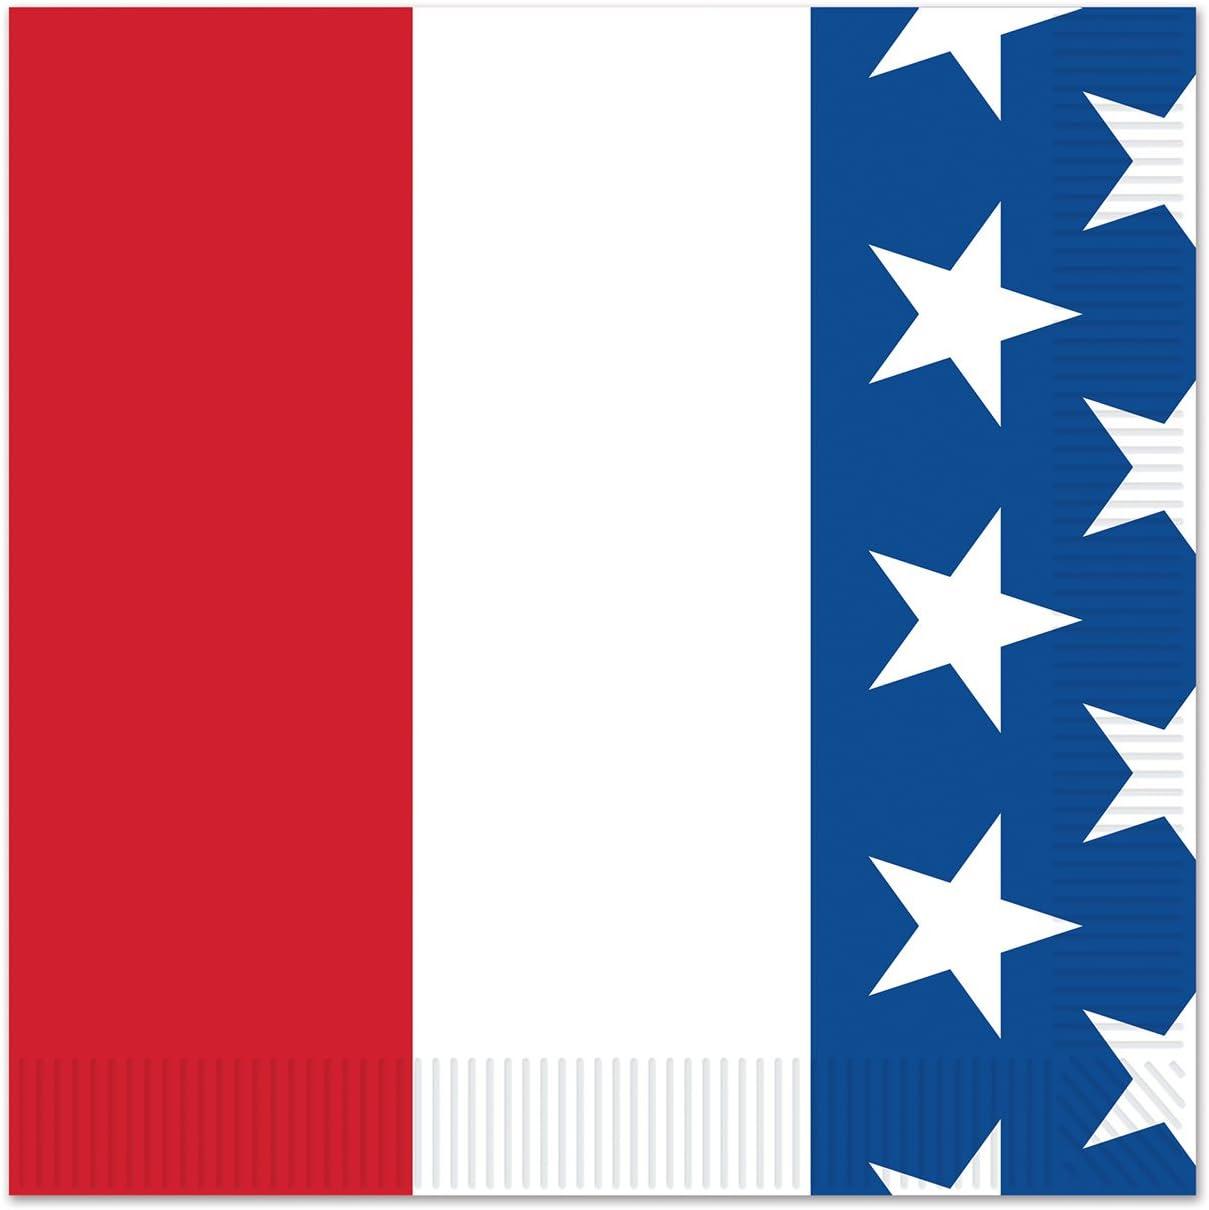 Beistle Patriotic Beverage Napkins, standard, Red/White/Blue